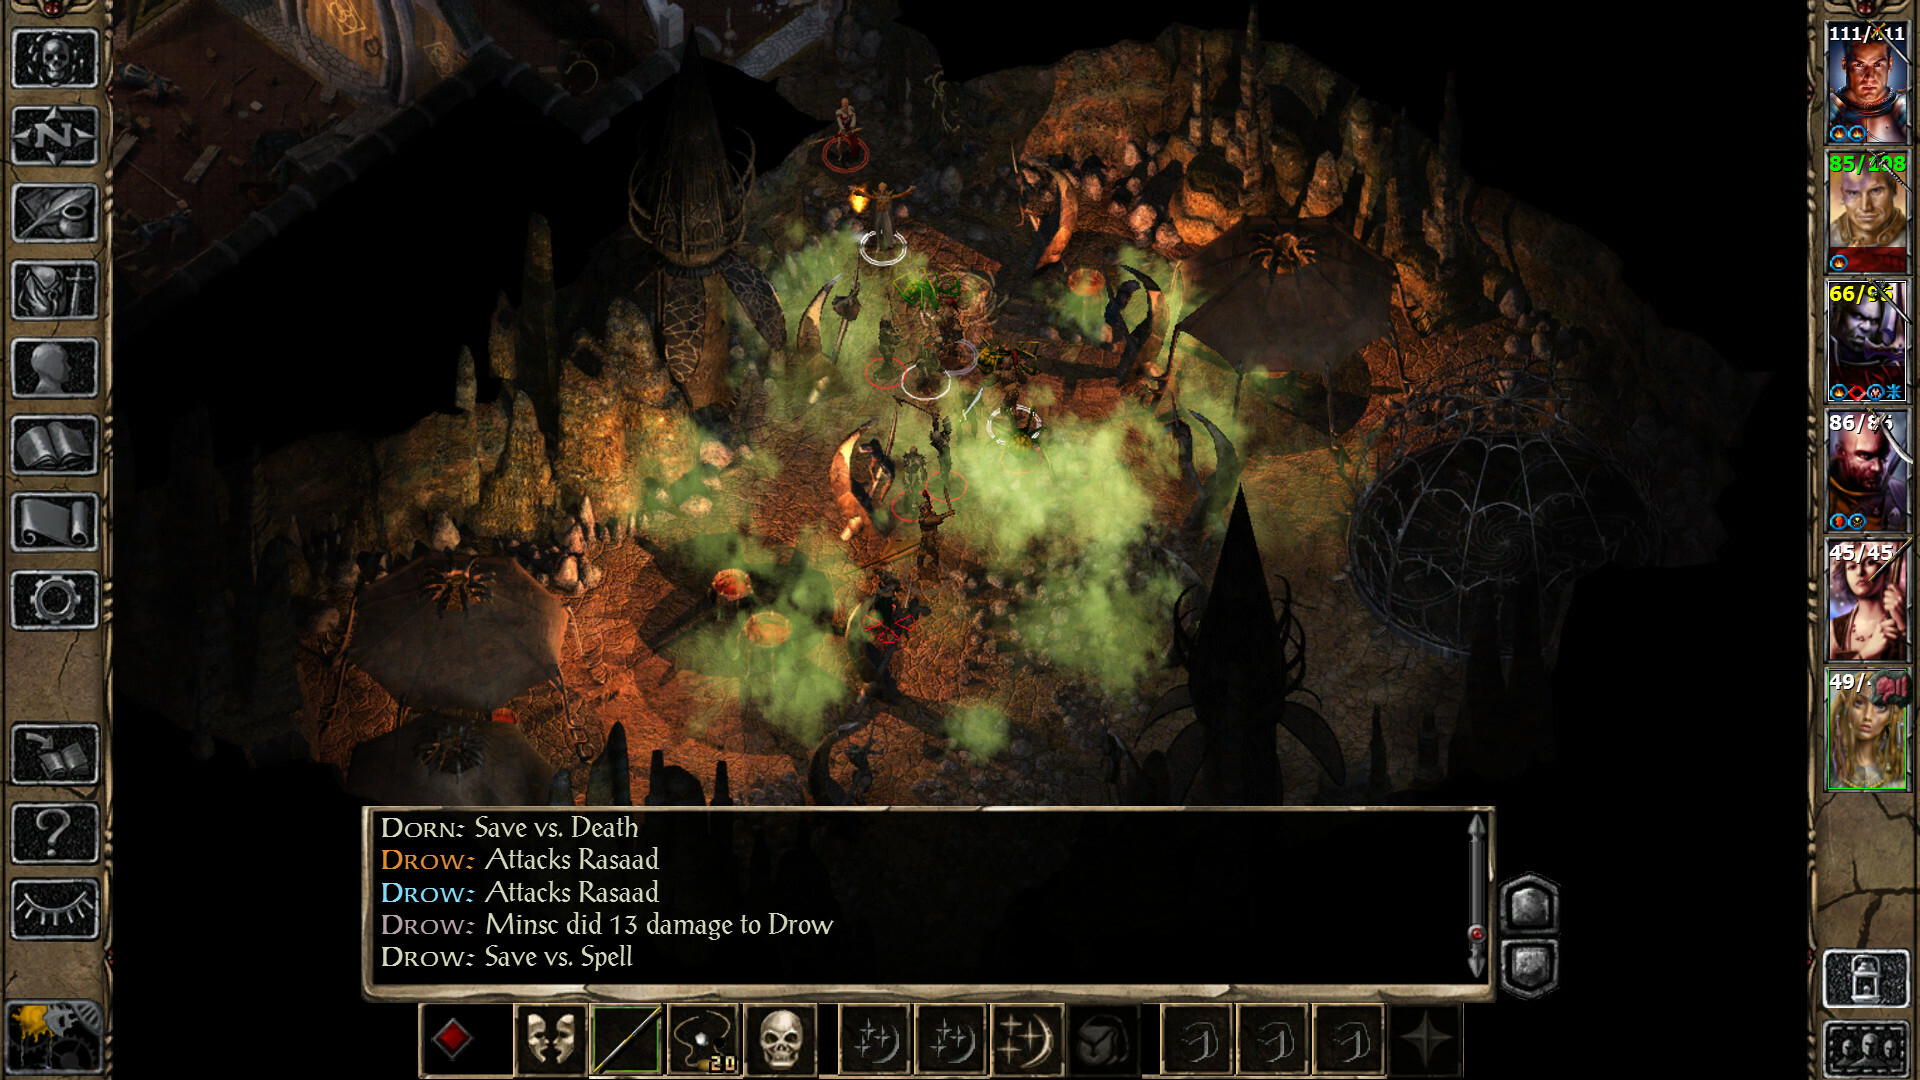 baldurs-gate-2-enhanced-edition-pc-screenshot-4